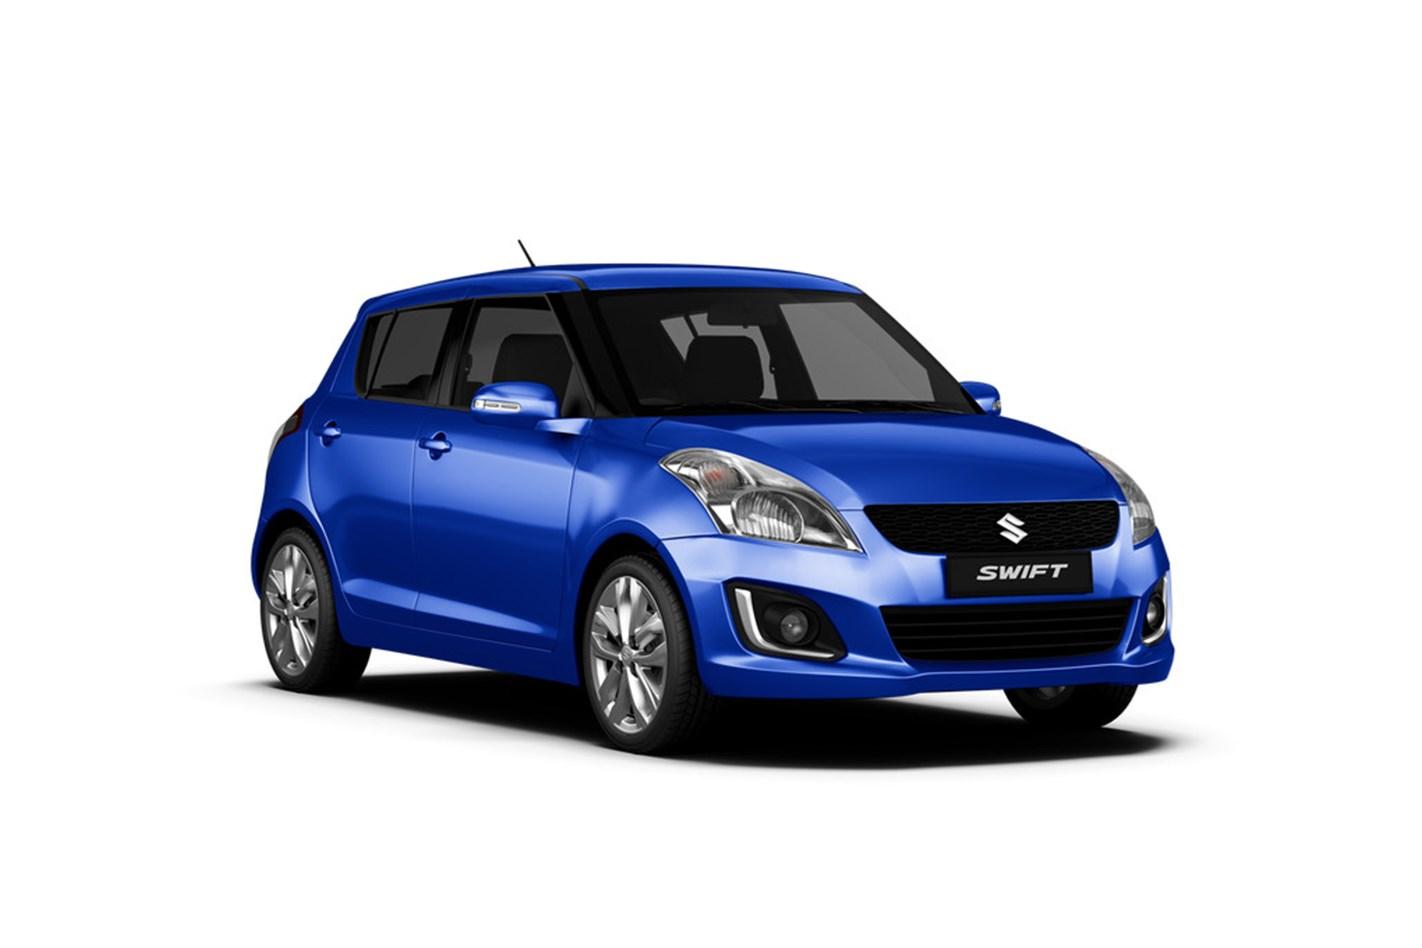 Suzuki Swift 2017 Fiyat Listesi | Uygun Taşıt